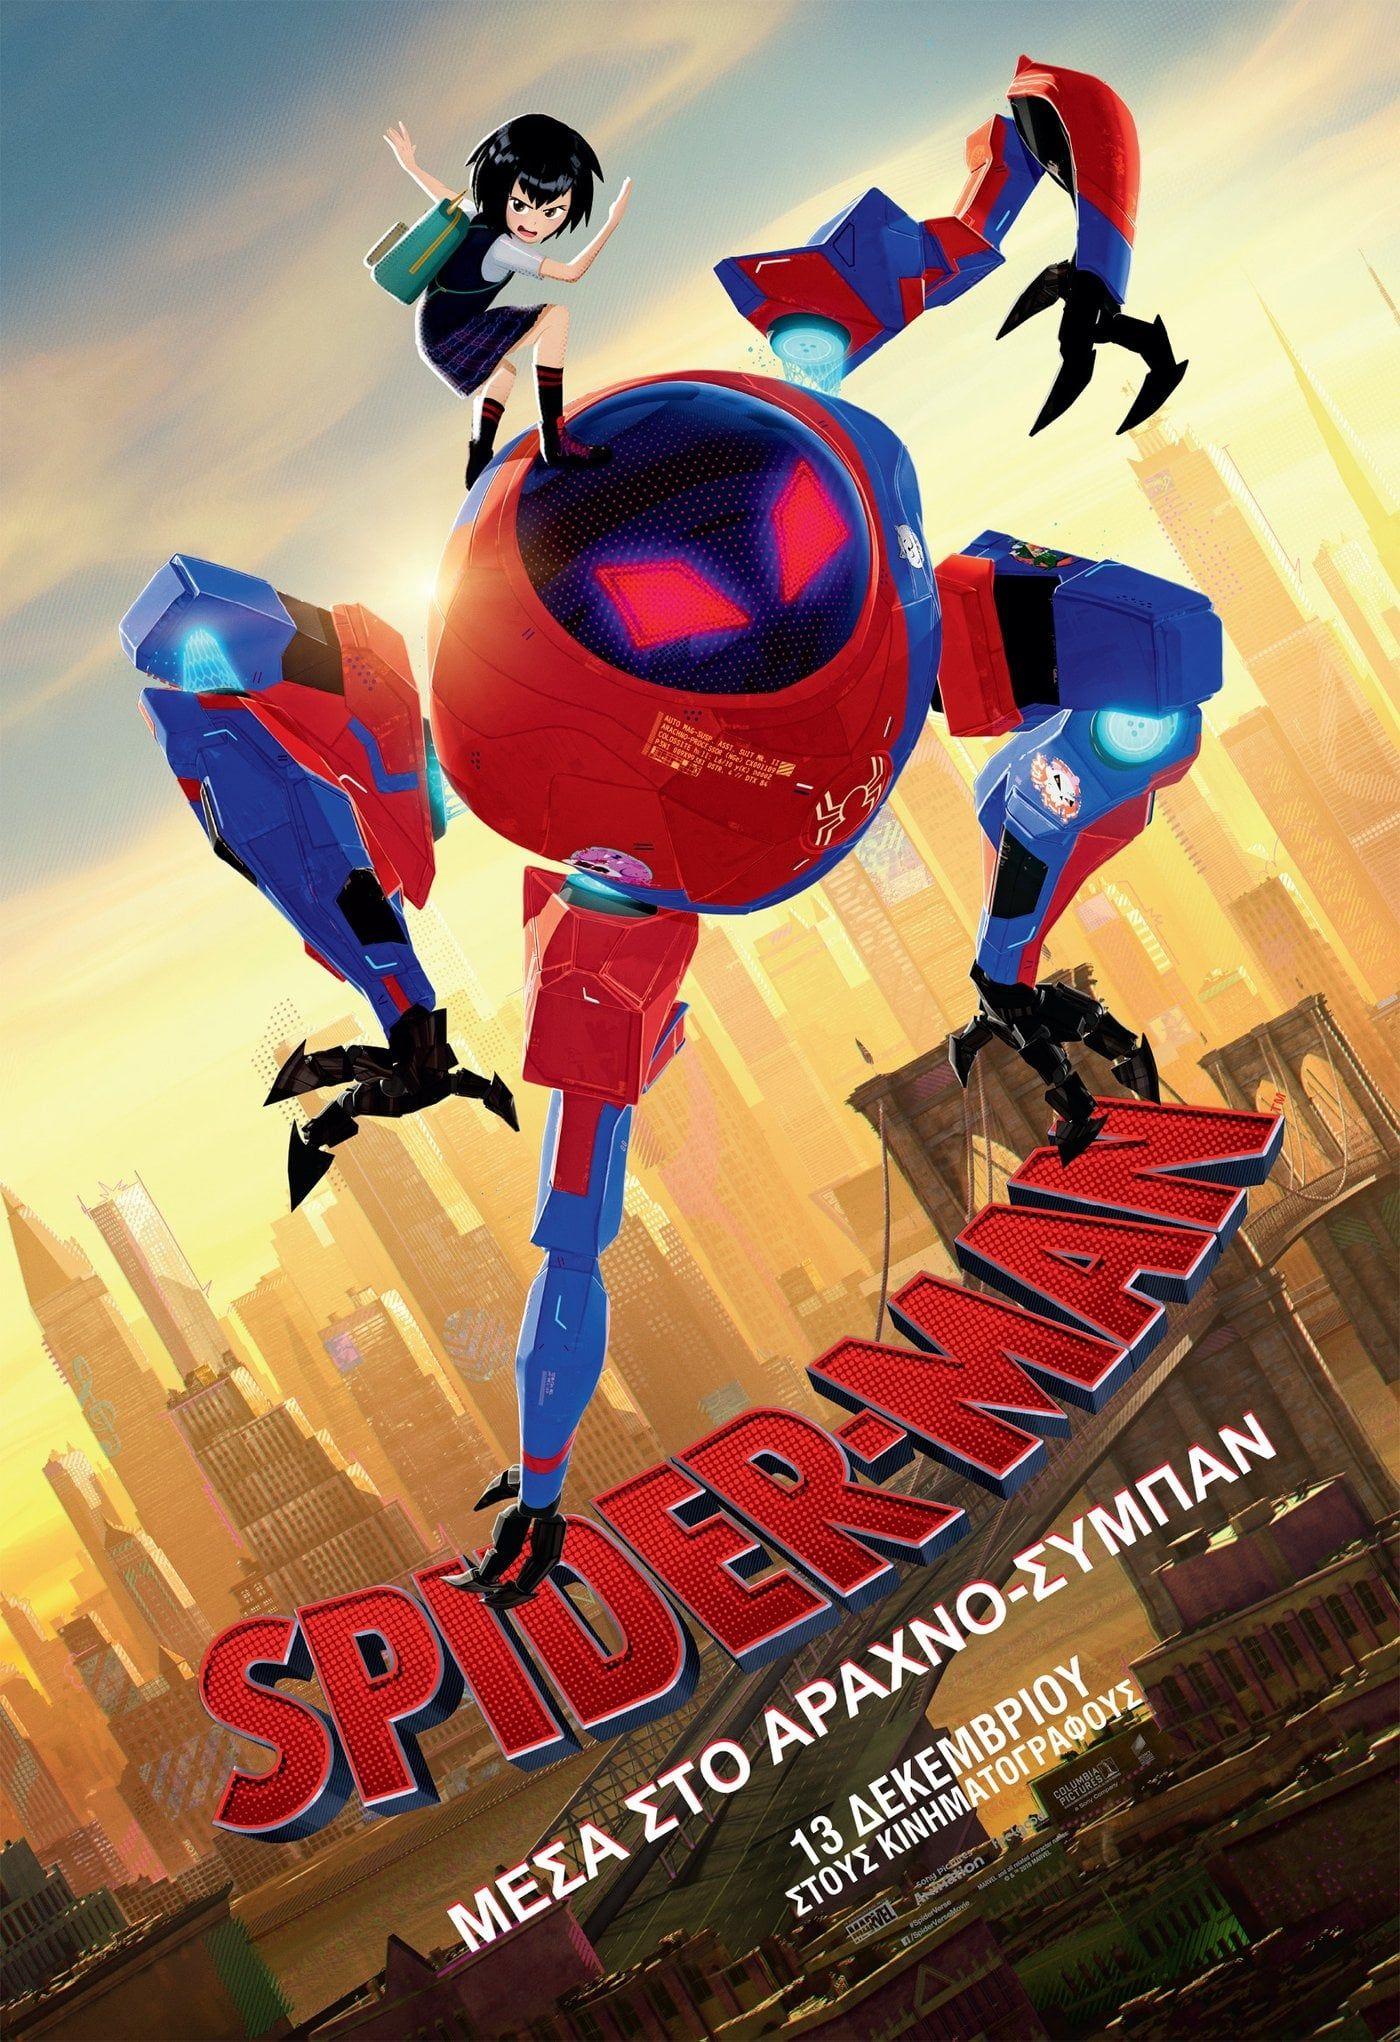 Spider Man Into The Spider Verse Streaming : spider, verse, streaming, Watch, Spider-Man:, Spider-Verse, Streaming, Complet, Movie, Laris, Spider, Verse,, Amazing, Spider,, Marvel, Animation